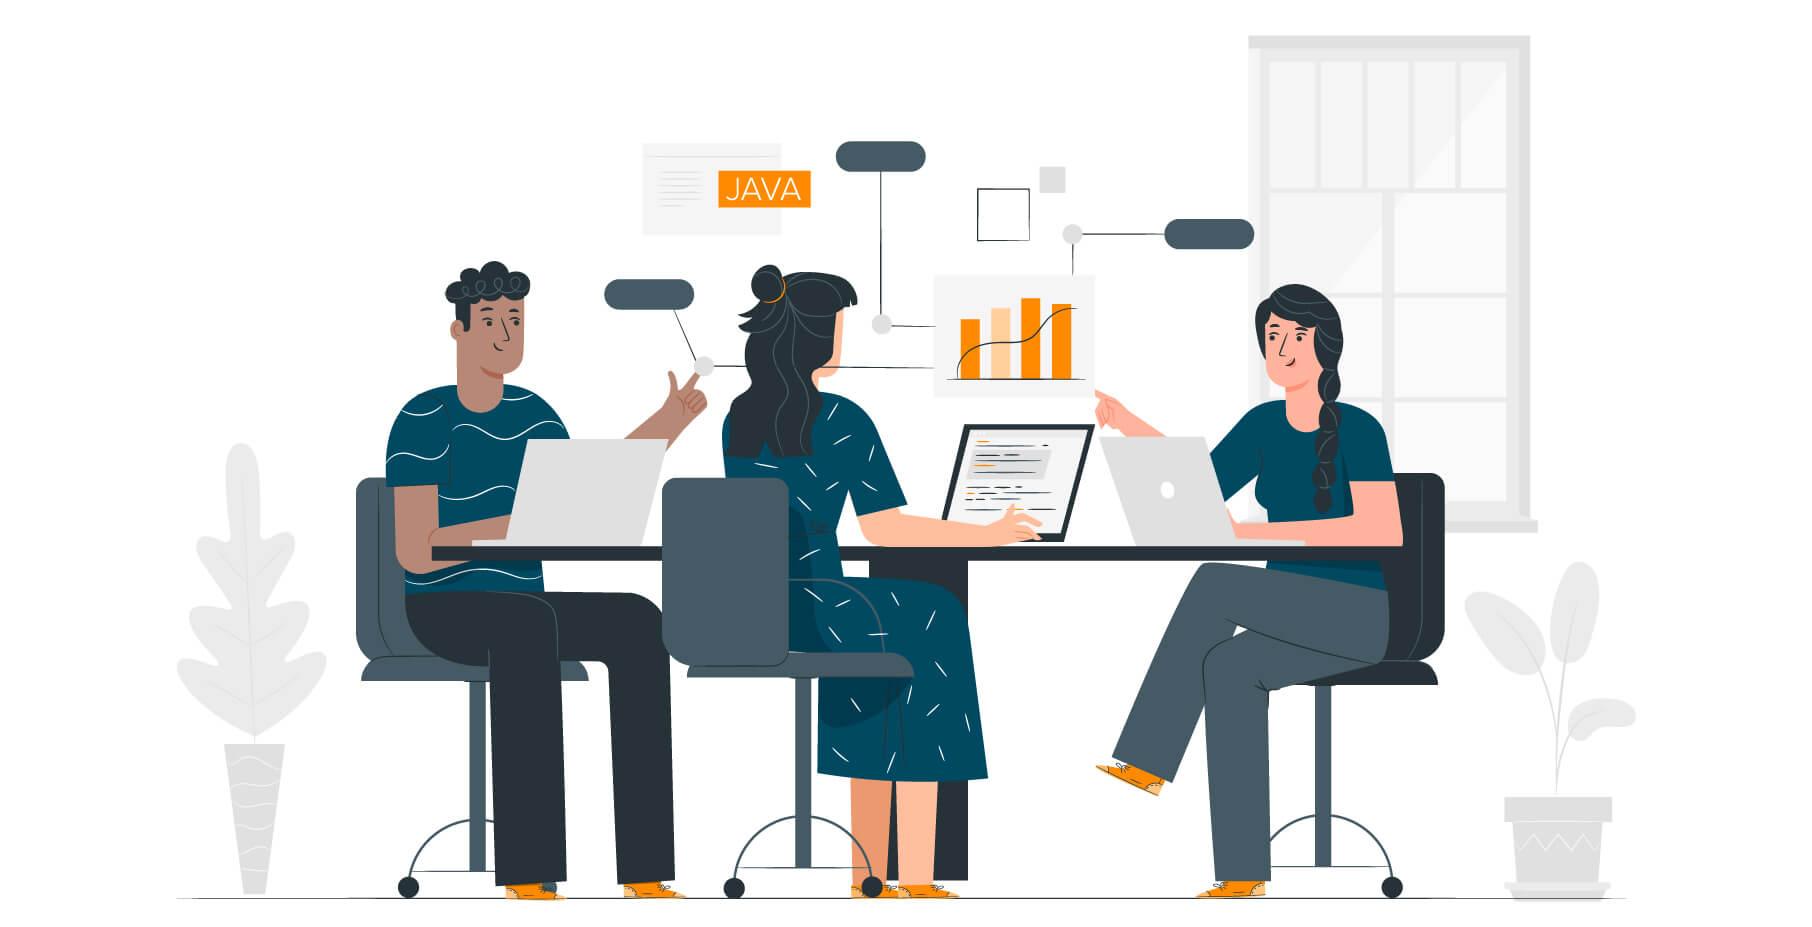 online java tutor providing homework help in java programming to students.